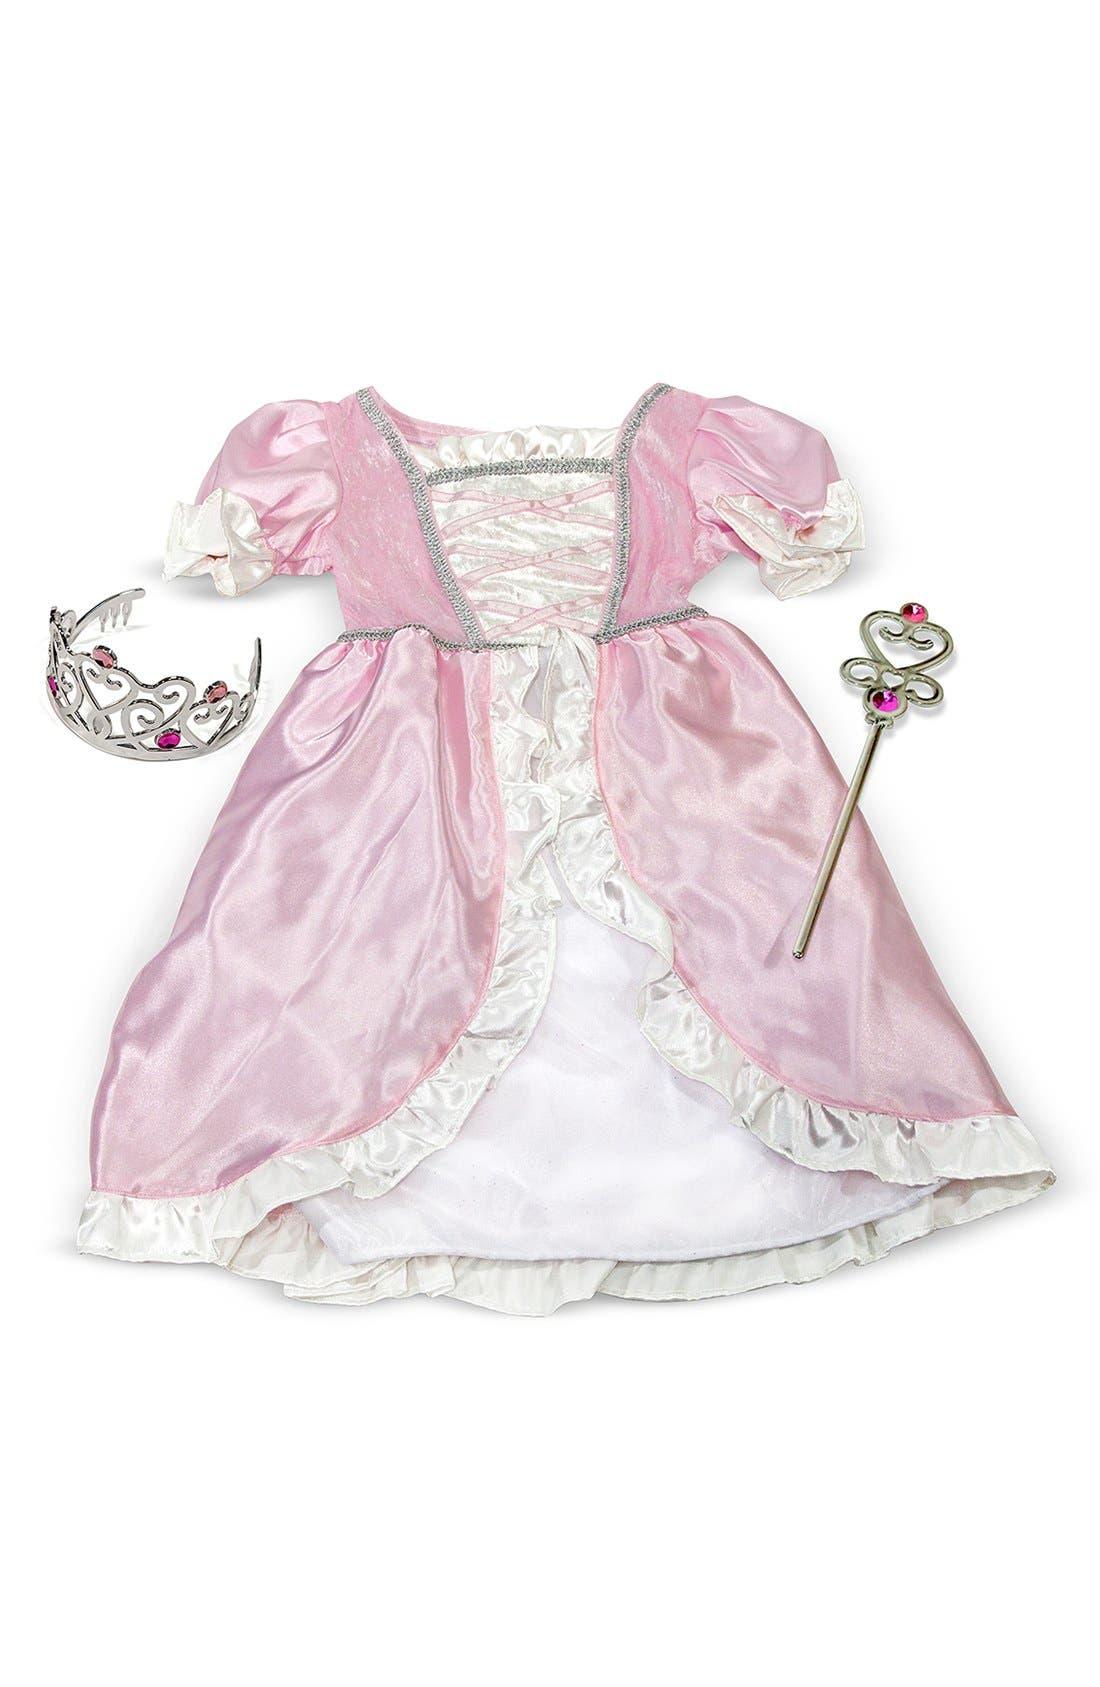 Personalized Princess Costume,                             Alternate thumbnail 2, color,                             650